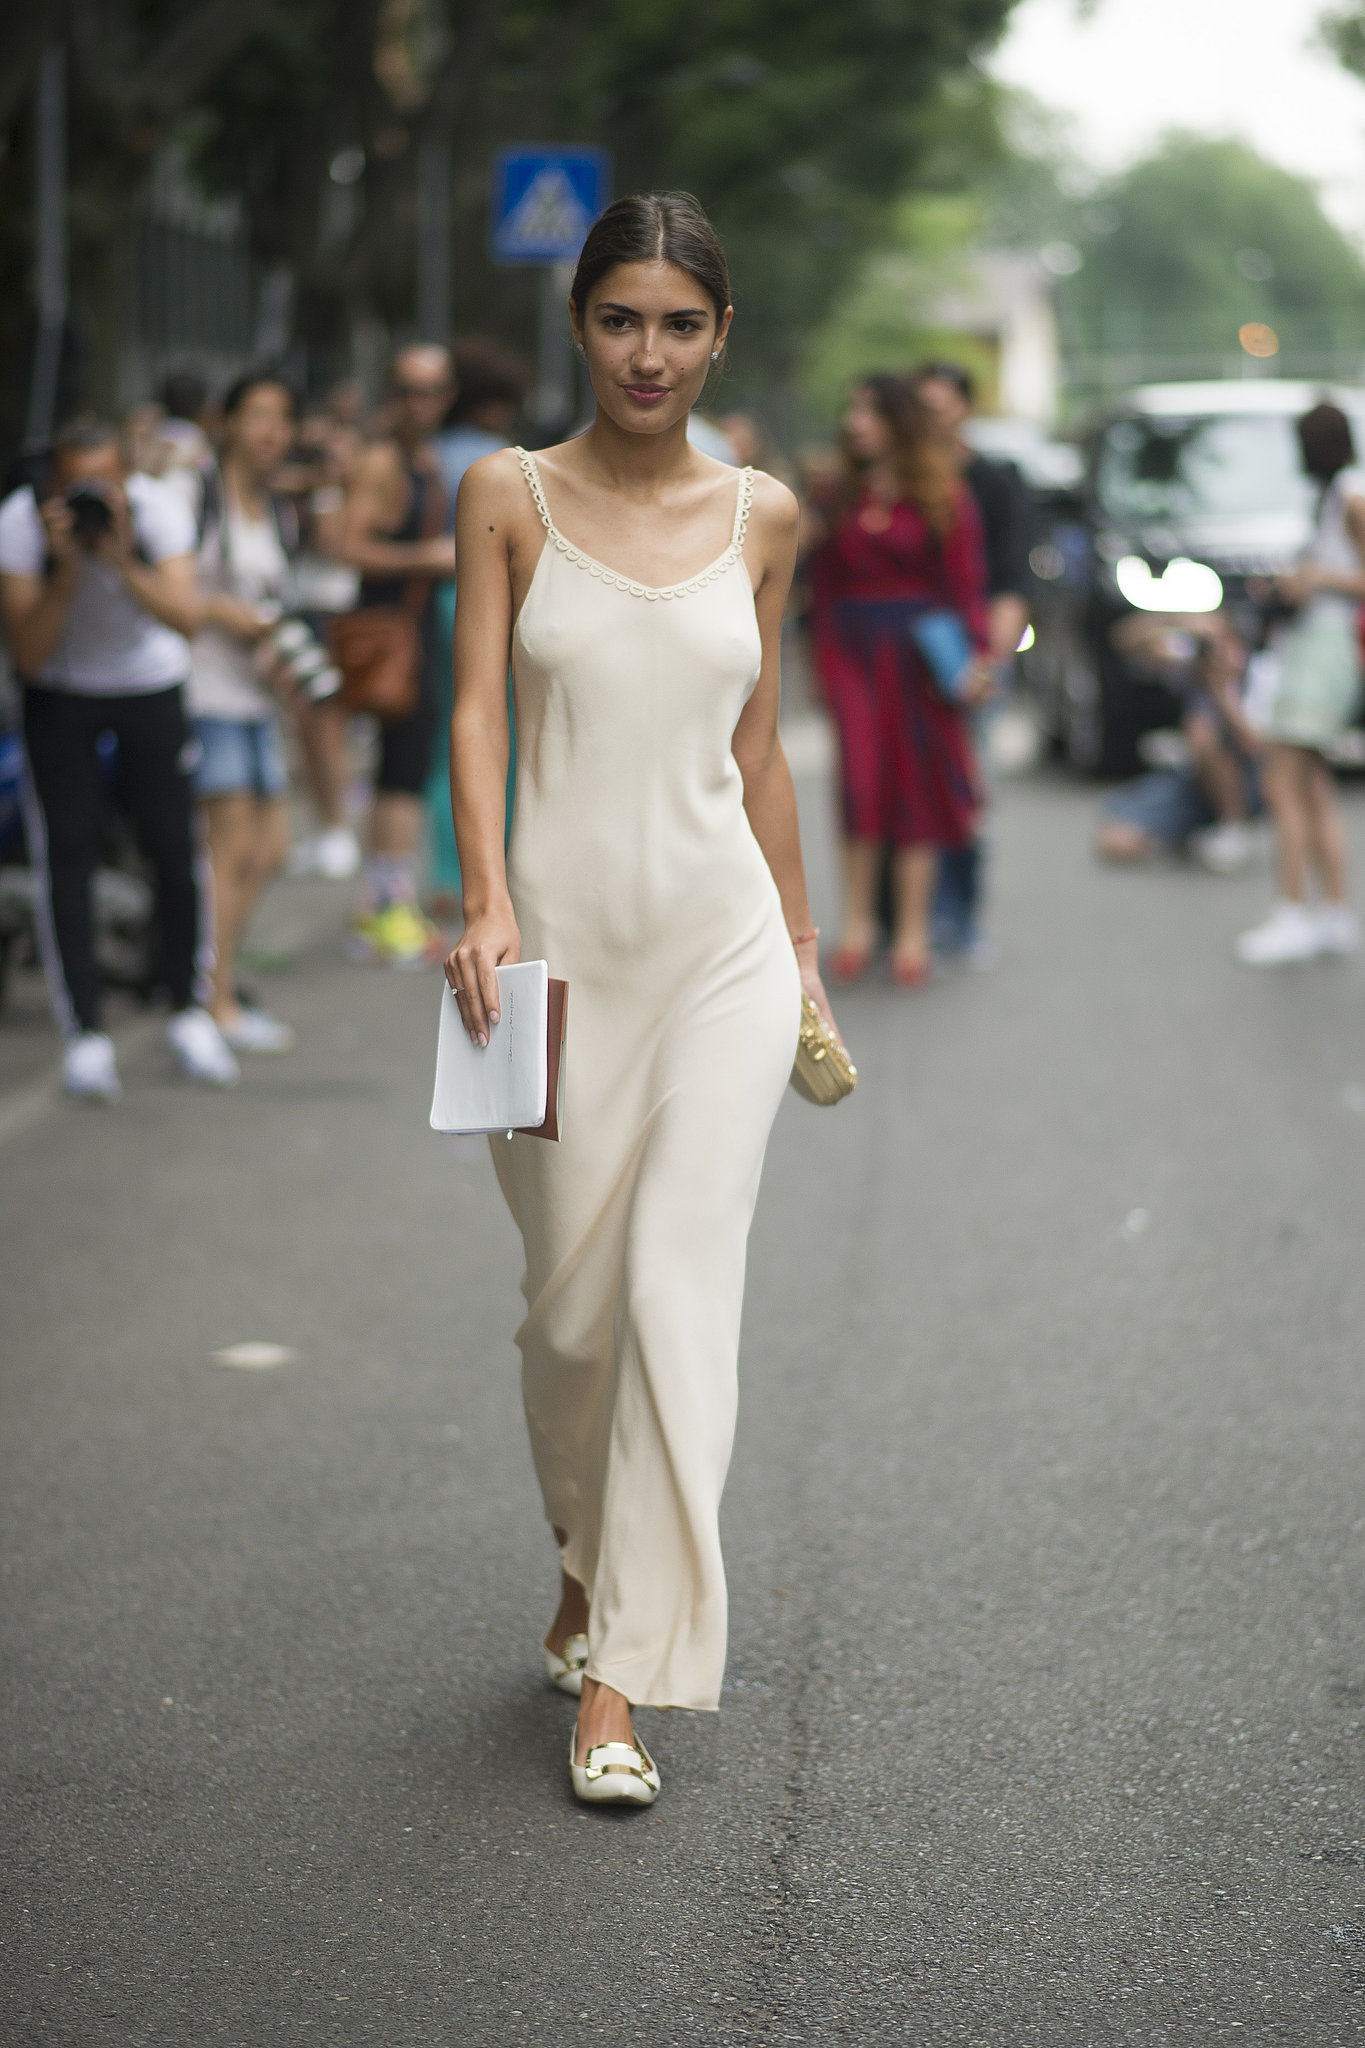 vestido_lencero_street_style_5